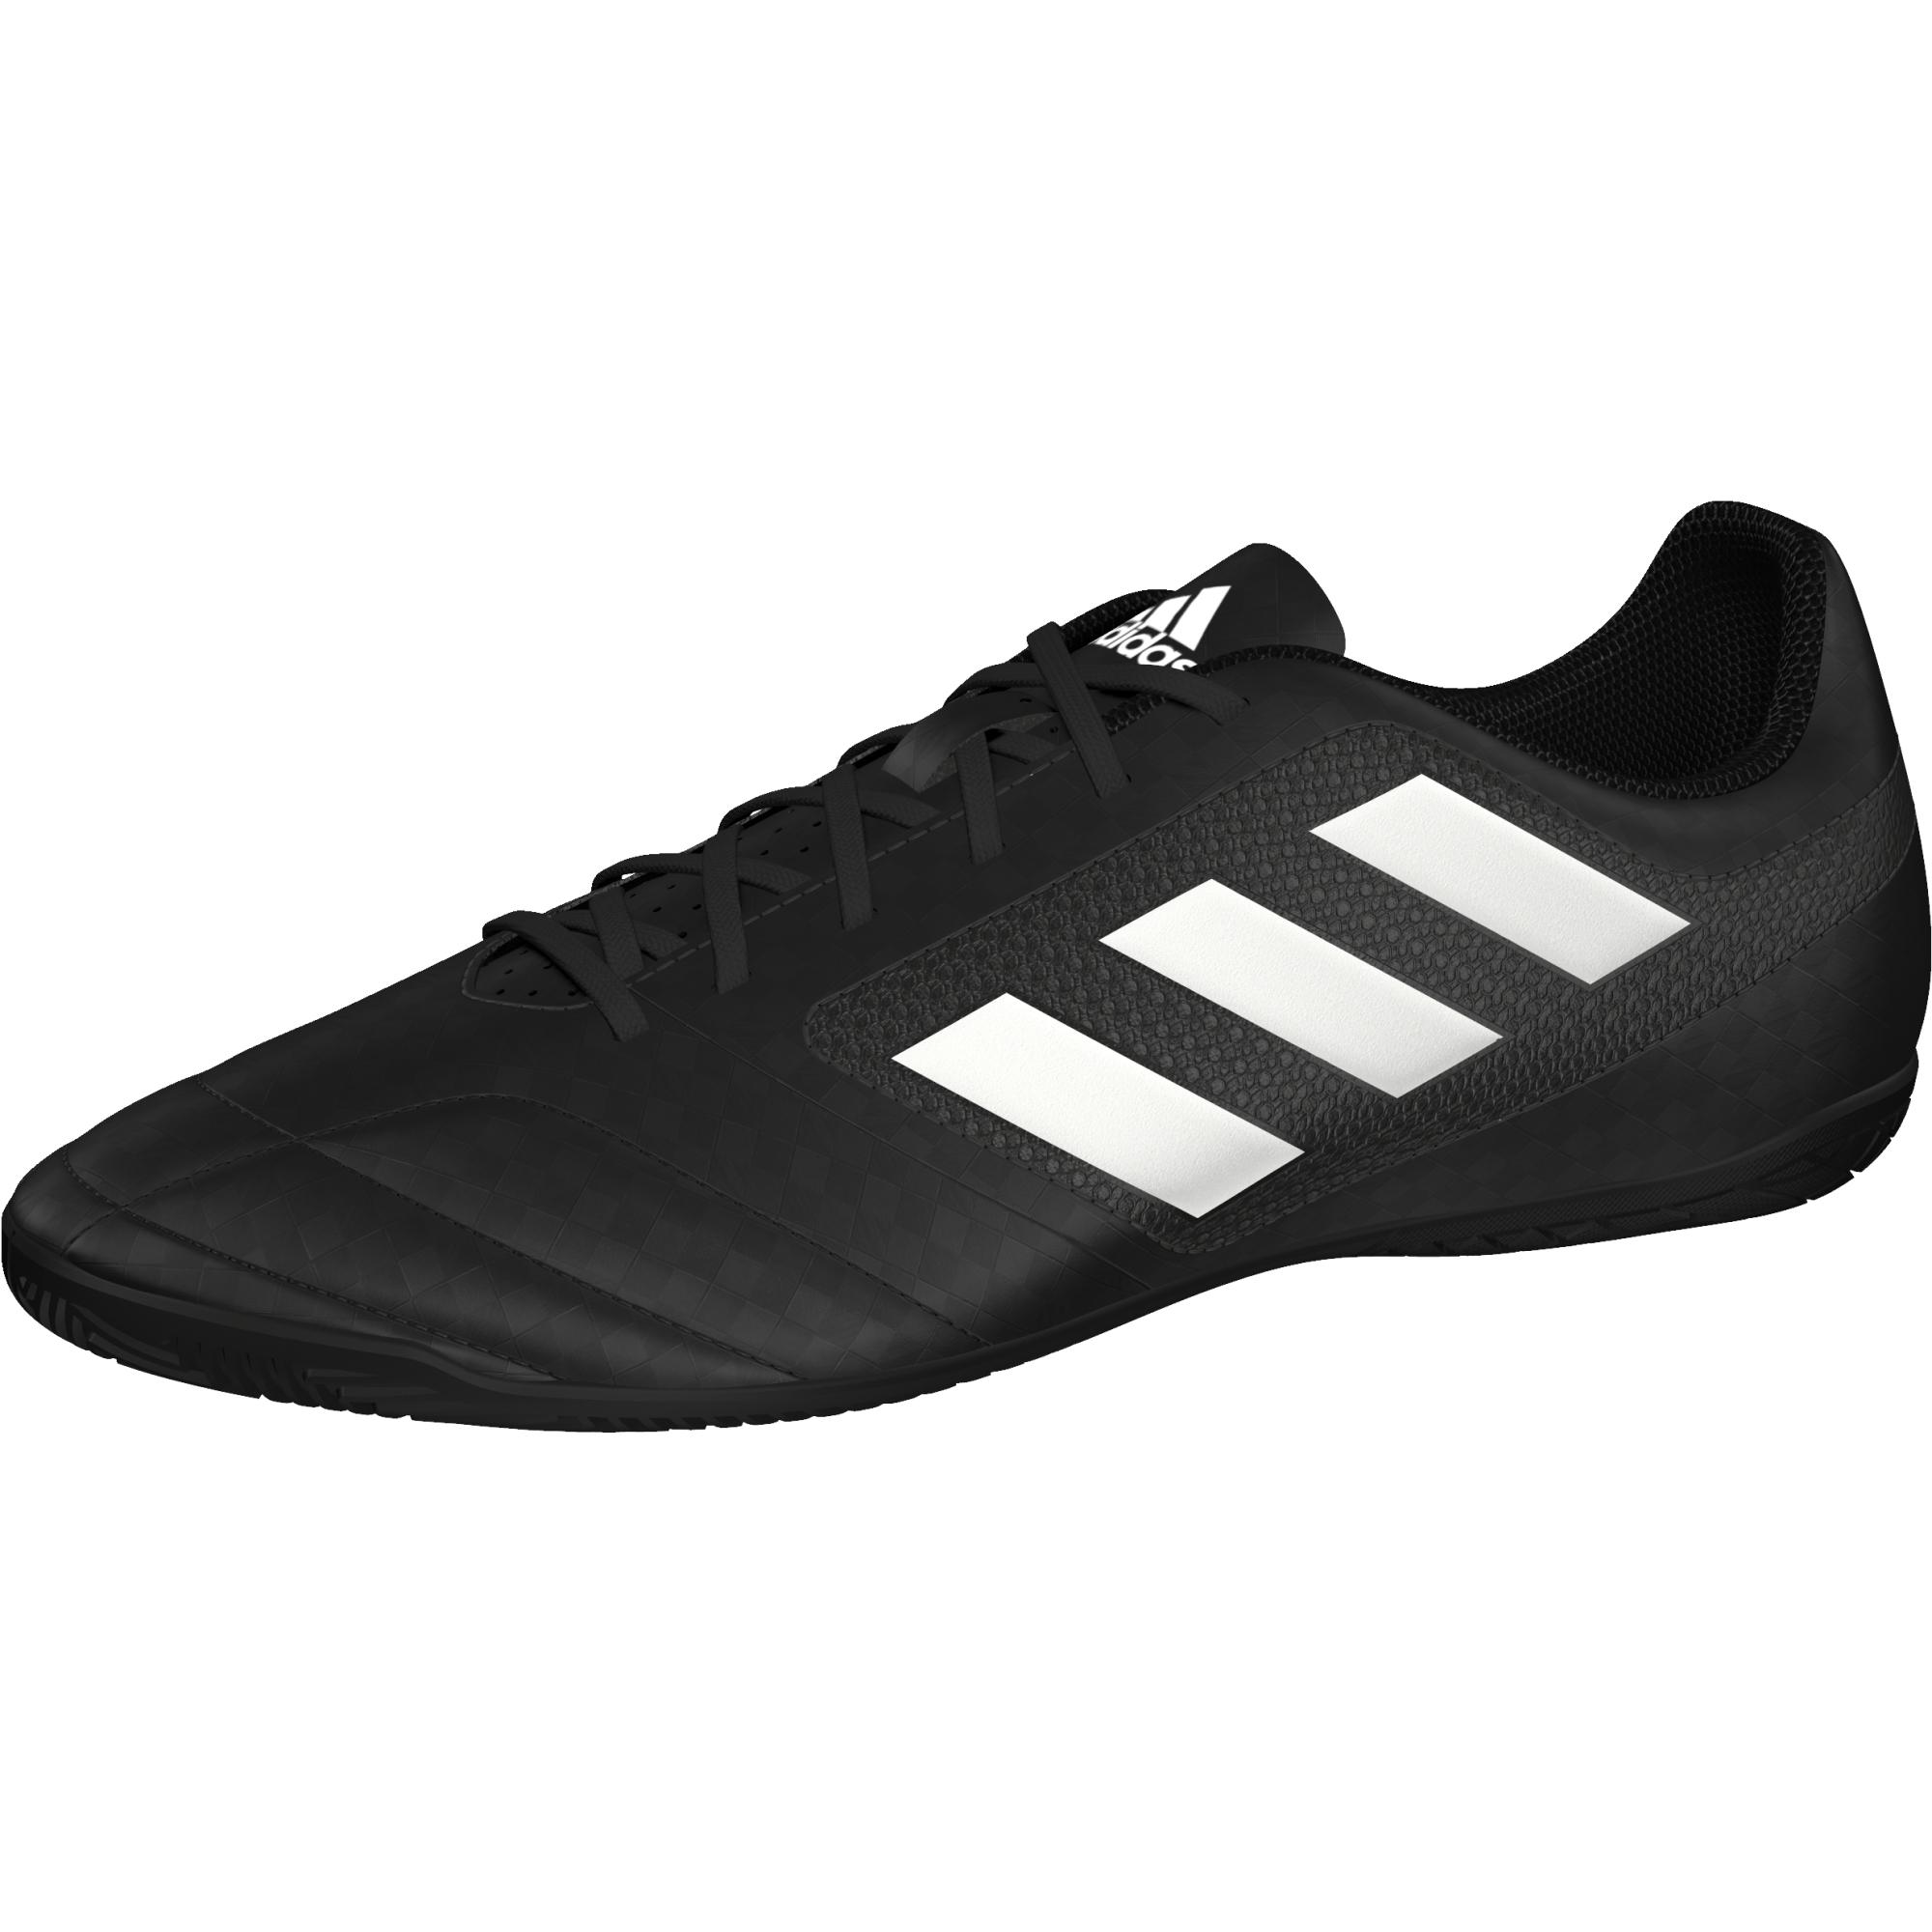 Adidas ACE 17.4 IN - BB1769 empty 80298382e33